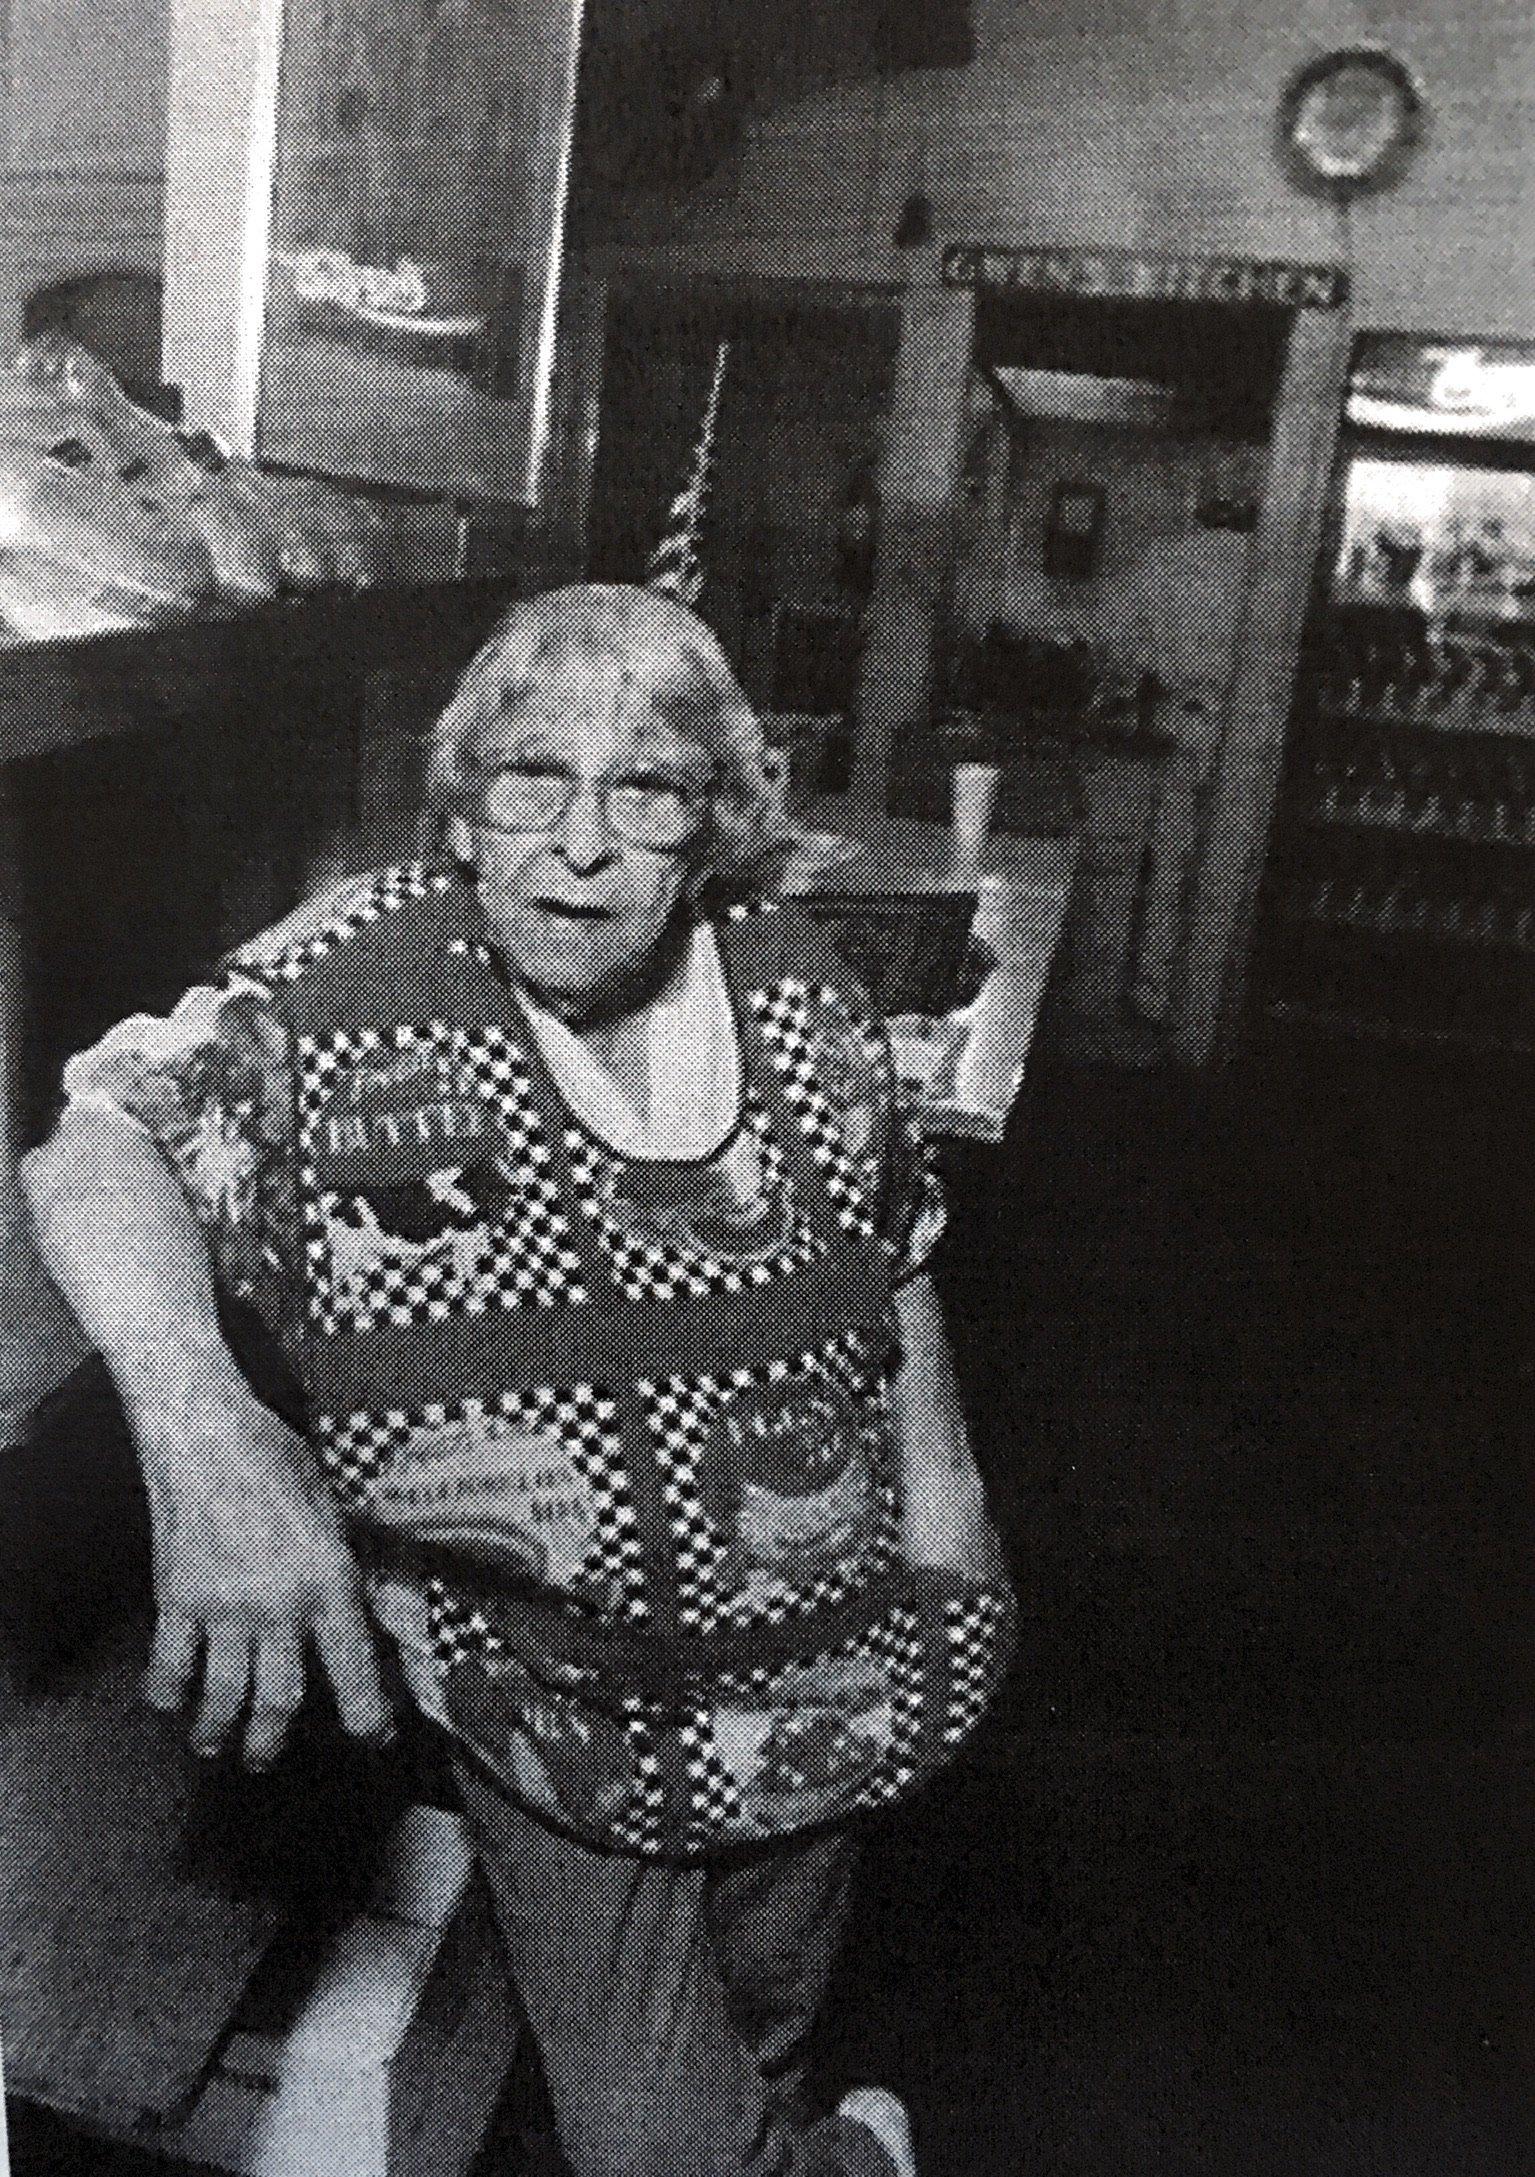 Gwen Clingman from Goldenseal, Spring 1999.